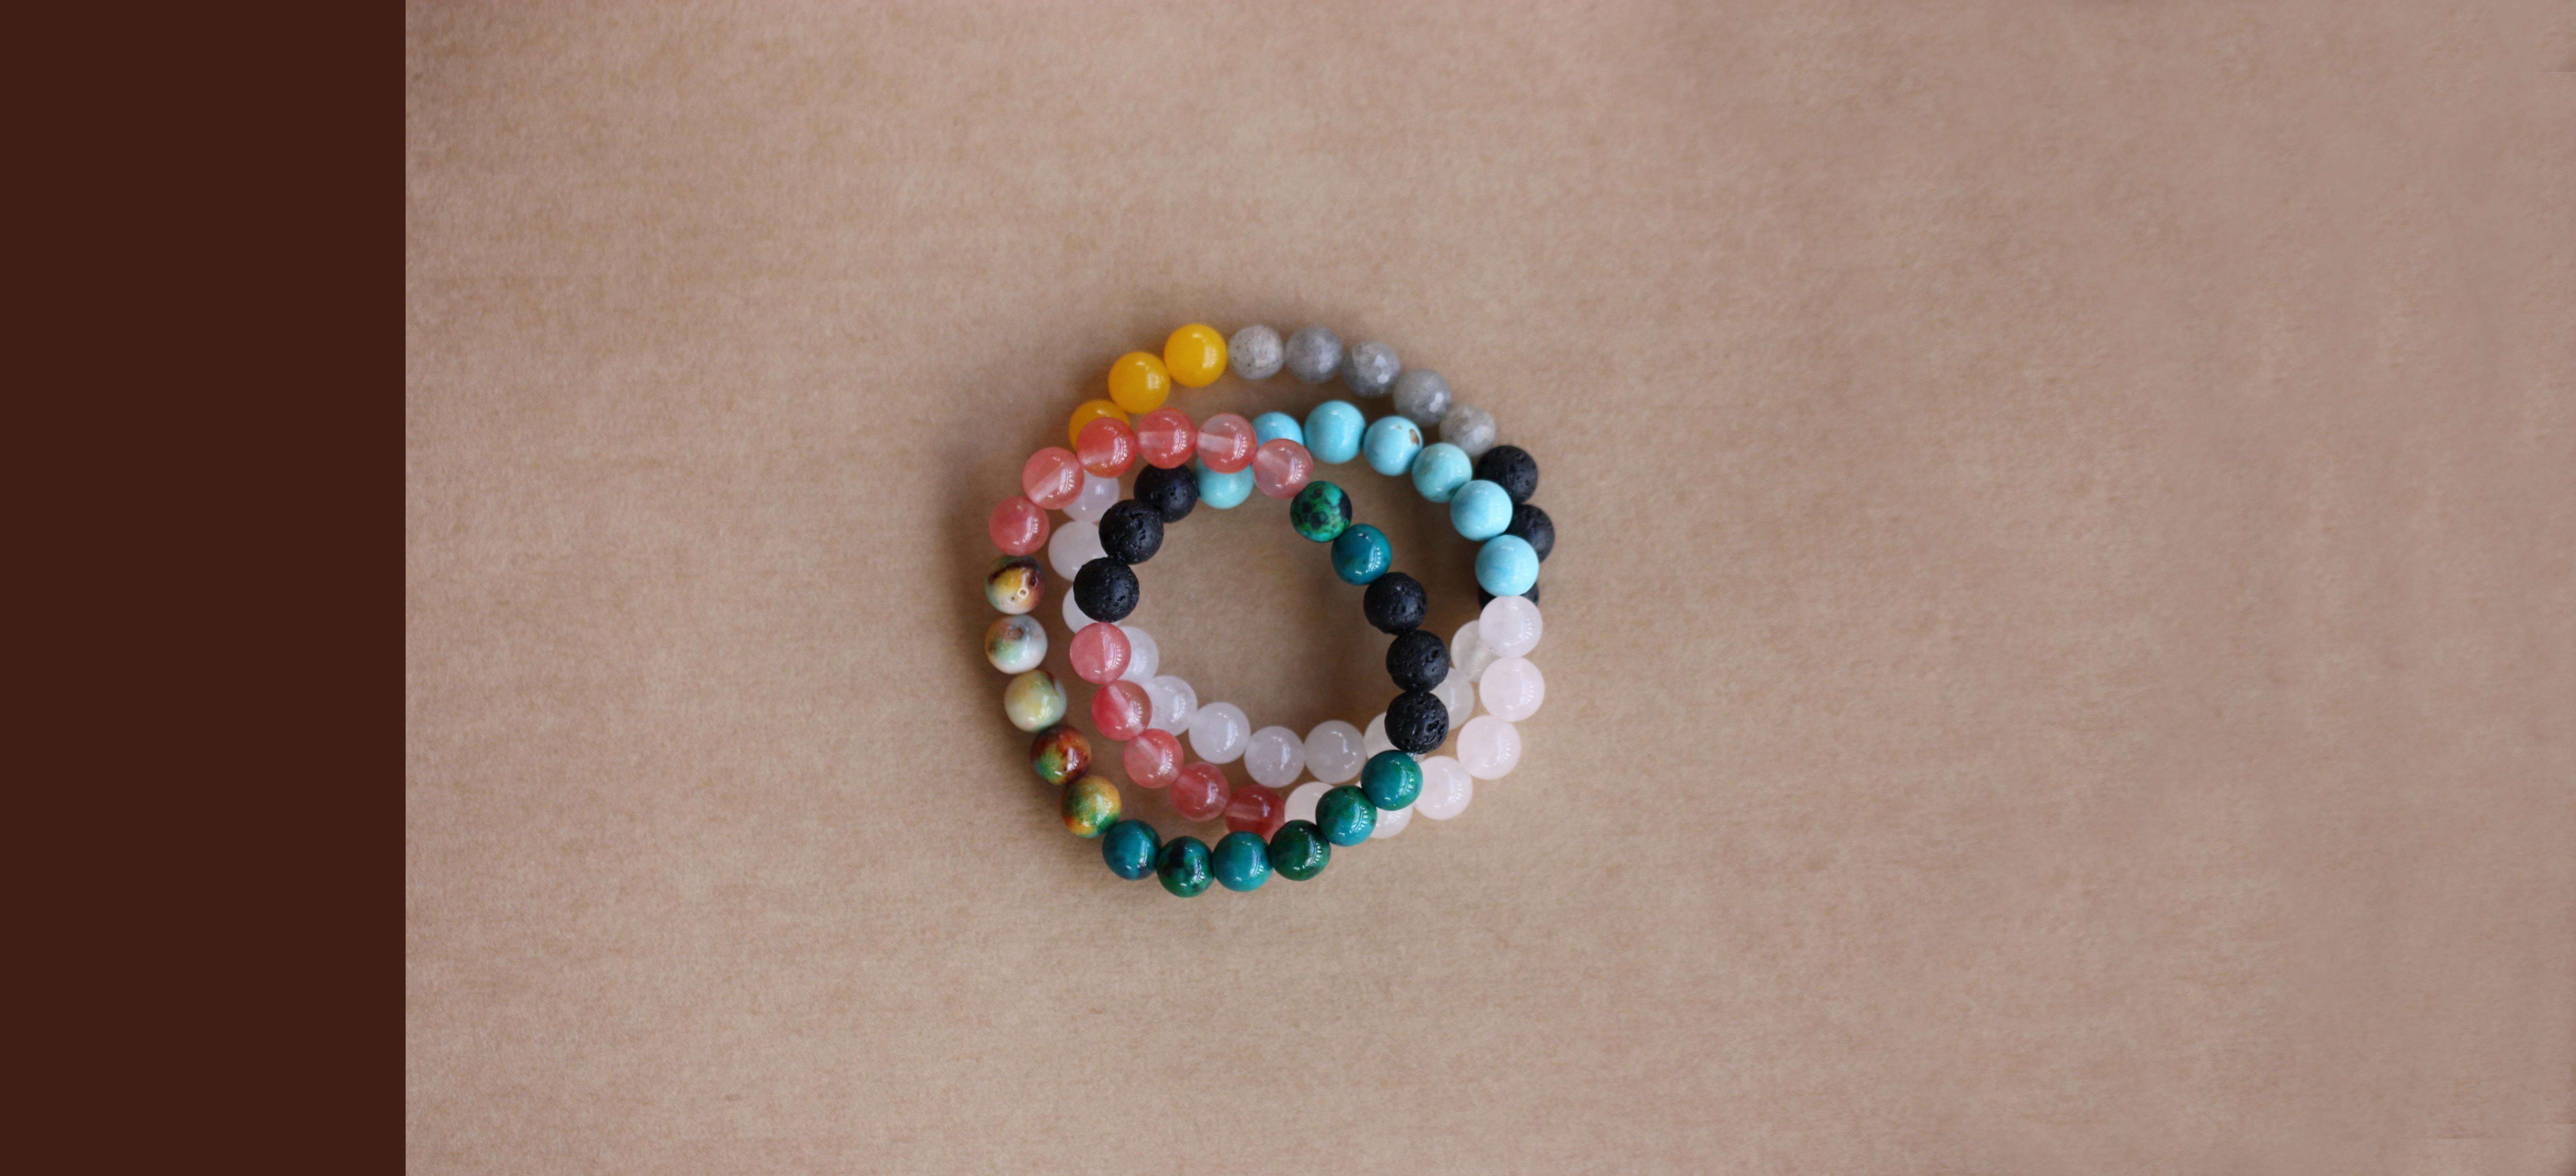 Gemstone Diffuser Bracelets & Essential Oils